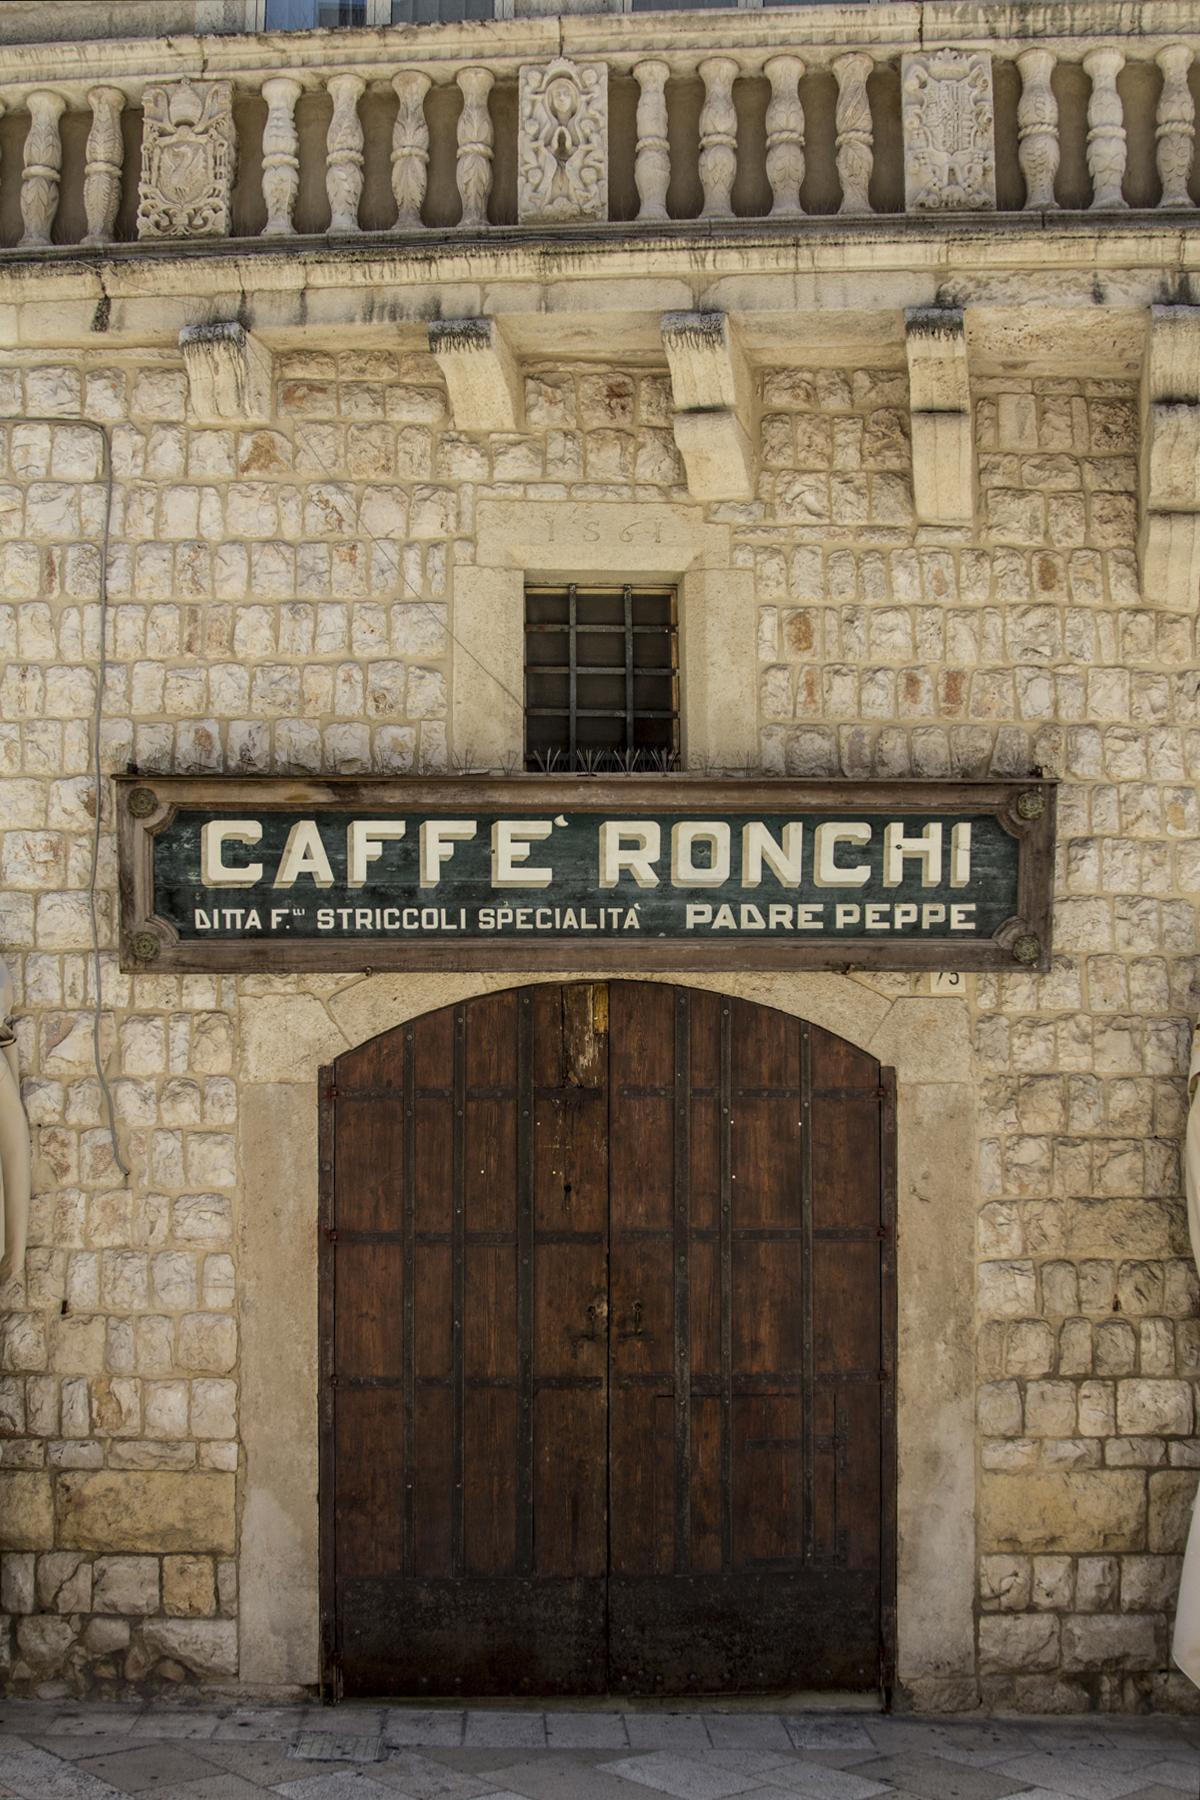 Puglia - Caffè Ronchi Altamura Rossella Venezia ph